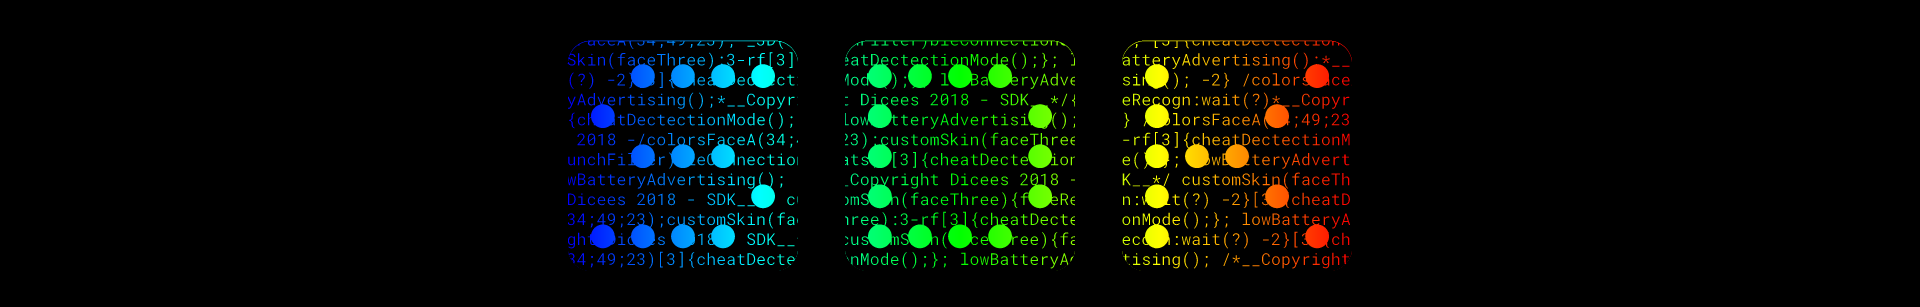 Dicees - Software Development Kit